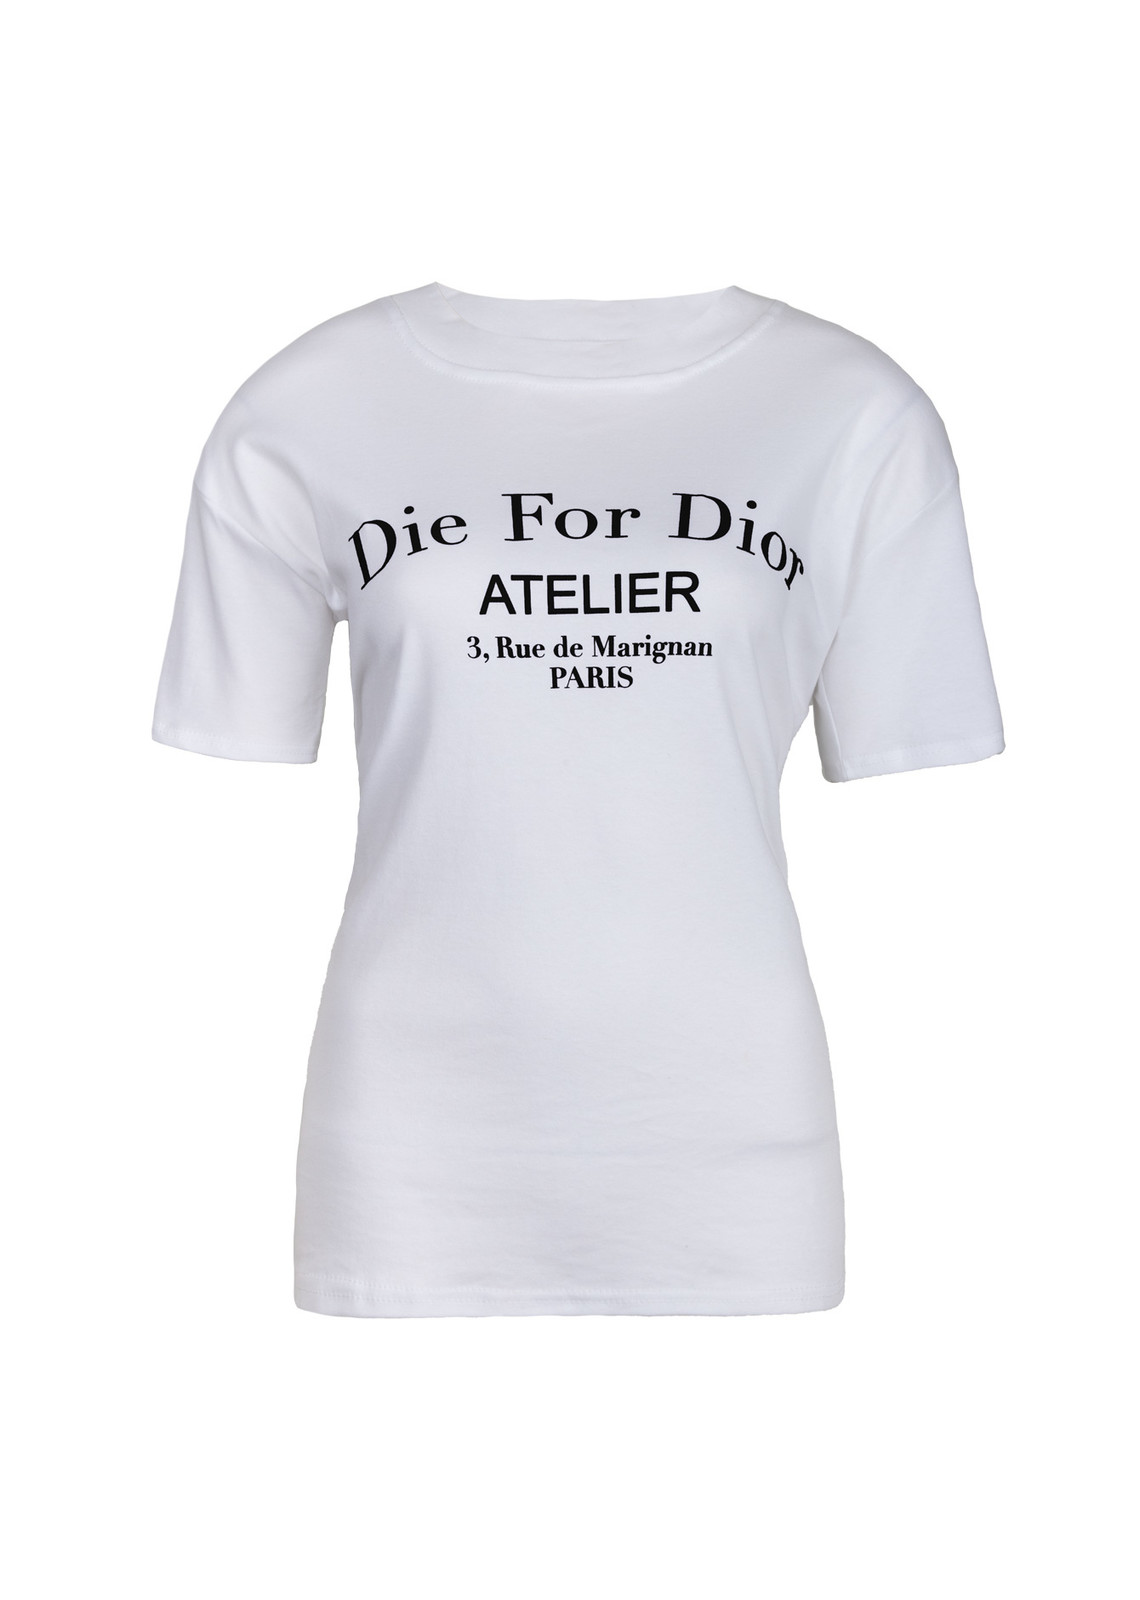 Die for shirt white